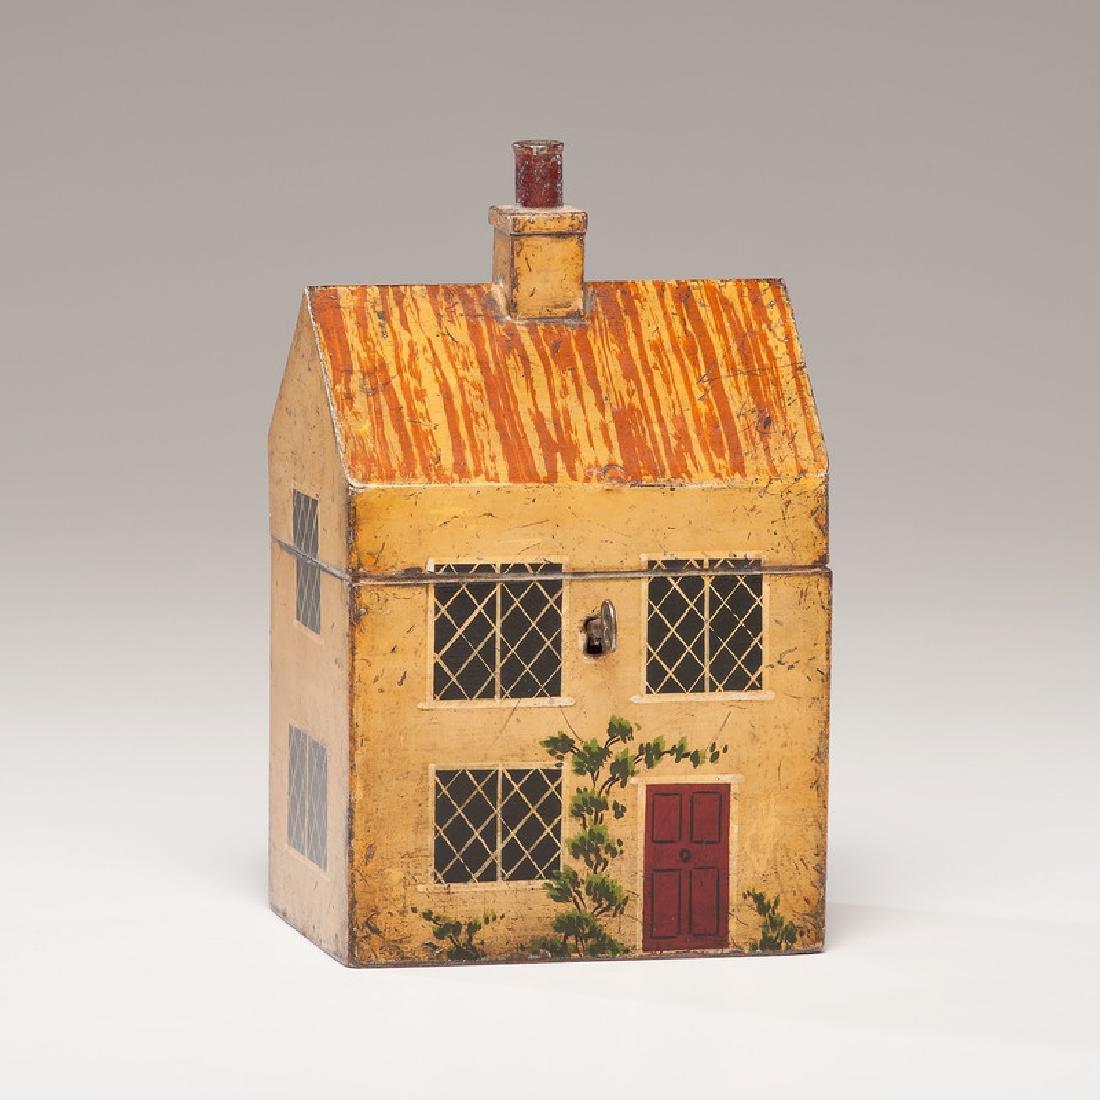 Rare Toleware Cottage Form Tea Caddy